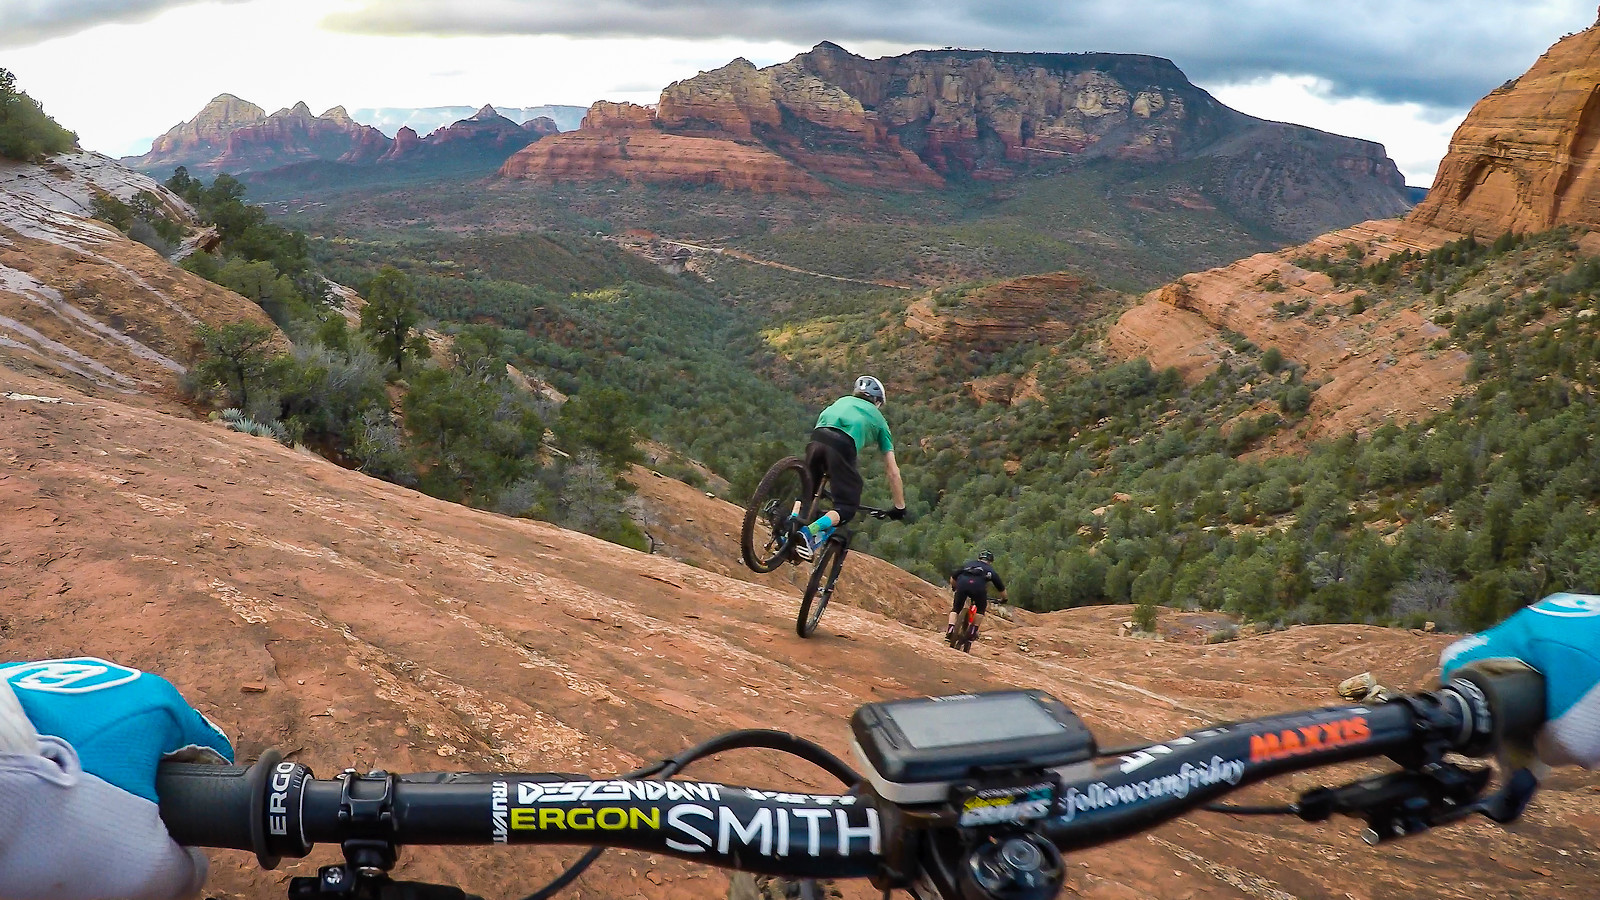 2019-01-17 17 21 28 - FlowyMcFlowerton - Mountain Biking Pictures - Vital MTB